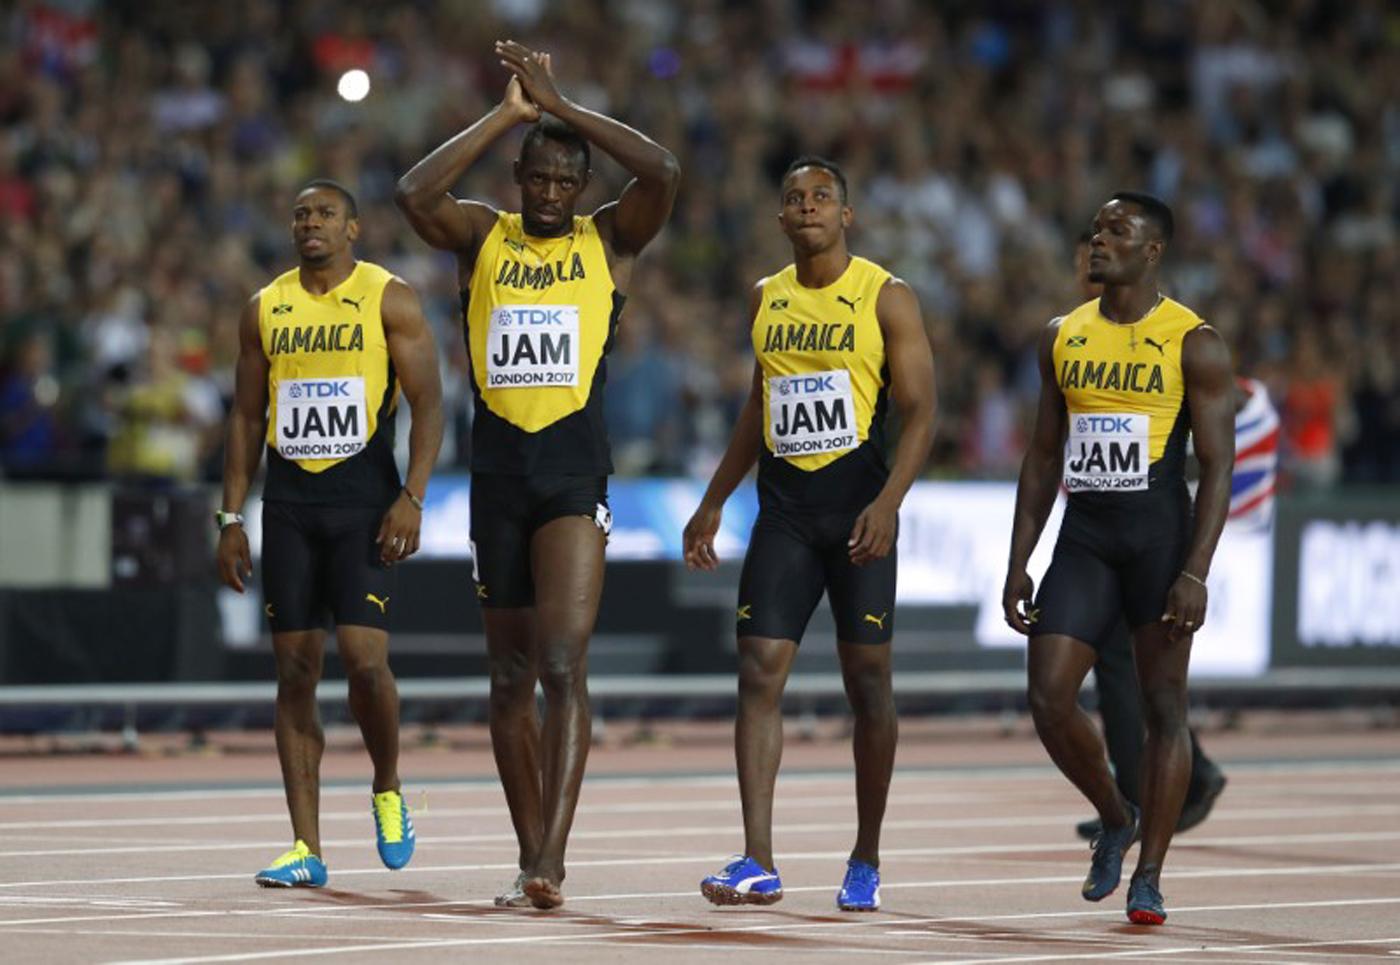 Atletismo - Campeonato Mundial de Atletismo - Final Posta Masculina 4x100 Metros - Estadio de Londres, Londres, Reino Unido – 12 de agosto, 2017. Omar McLeod, Julian Forte, Yohan Blake y Usain Bolt de Jamaica reaccionan después de la final. REUTERS/Phil Noble